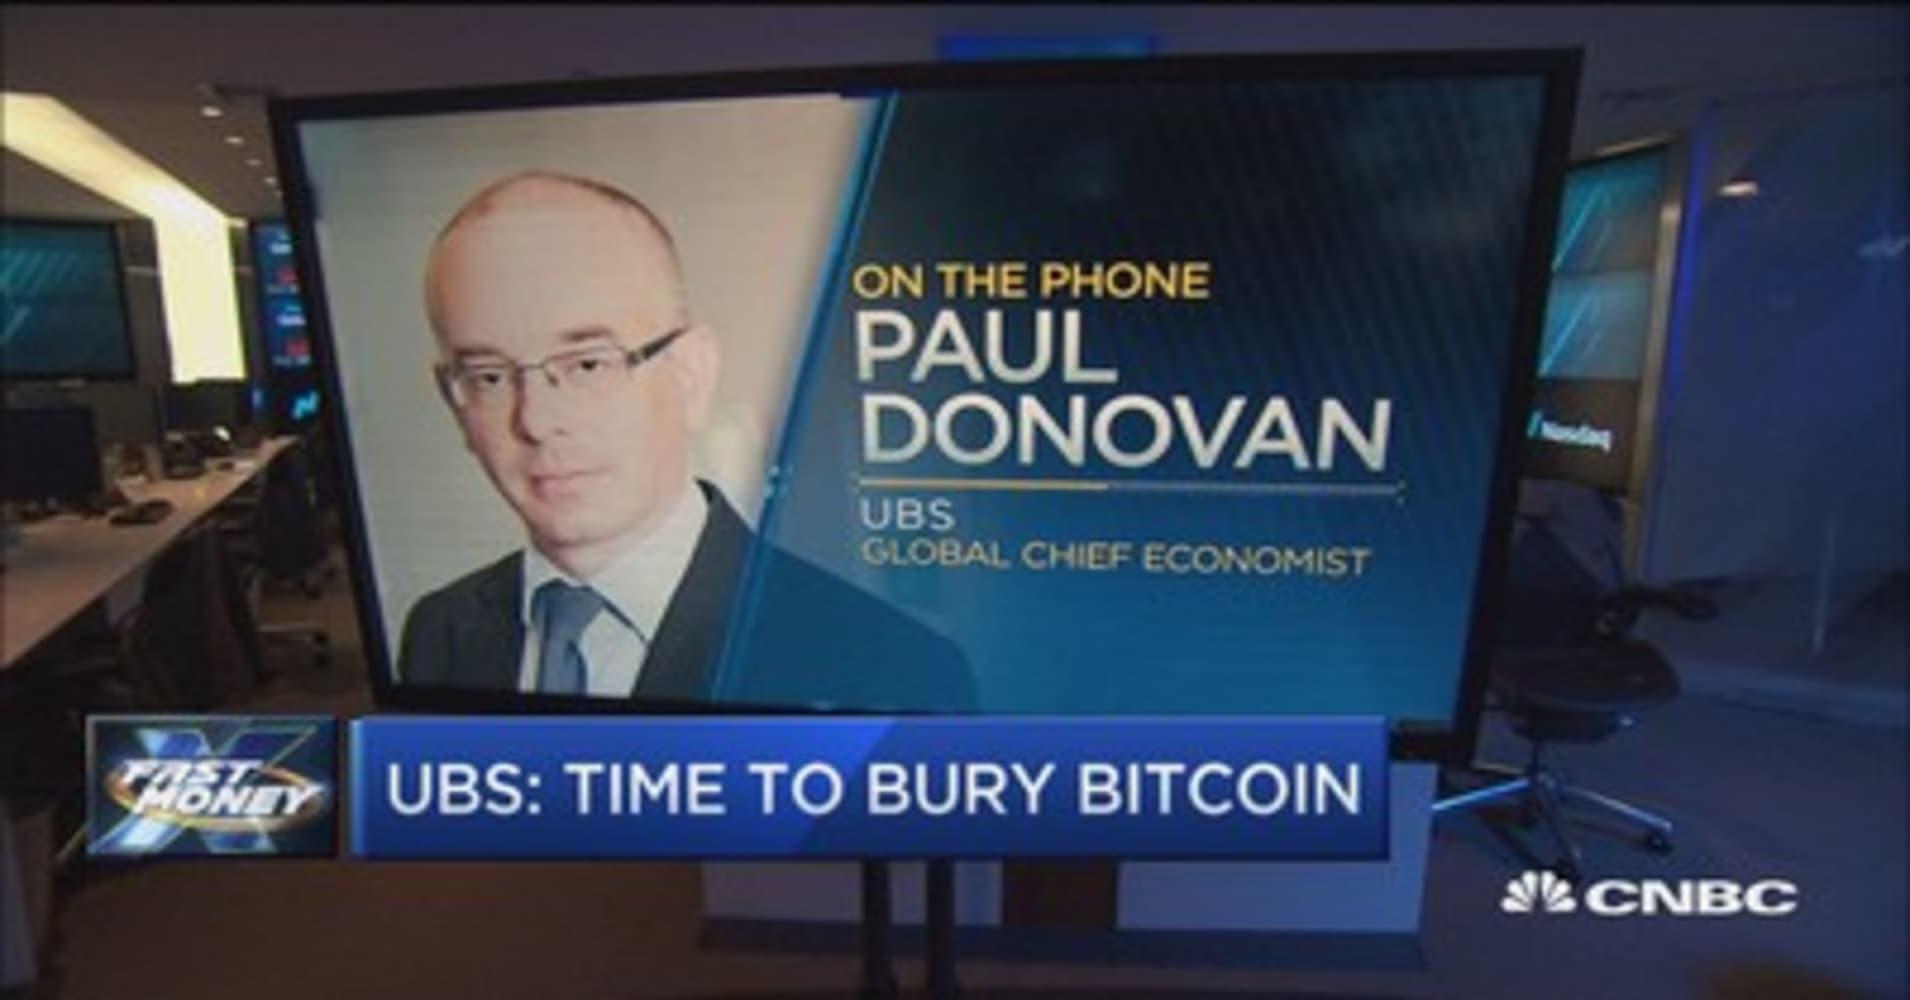 I come to bury bitcoin, says UBS' global chief economist